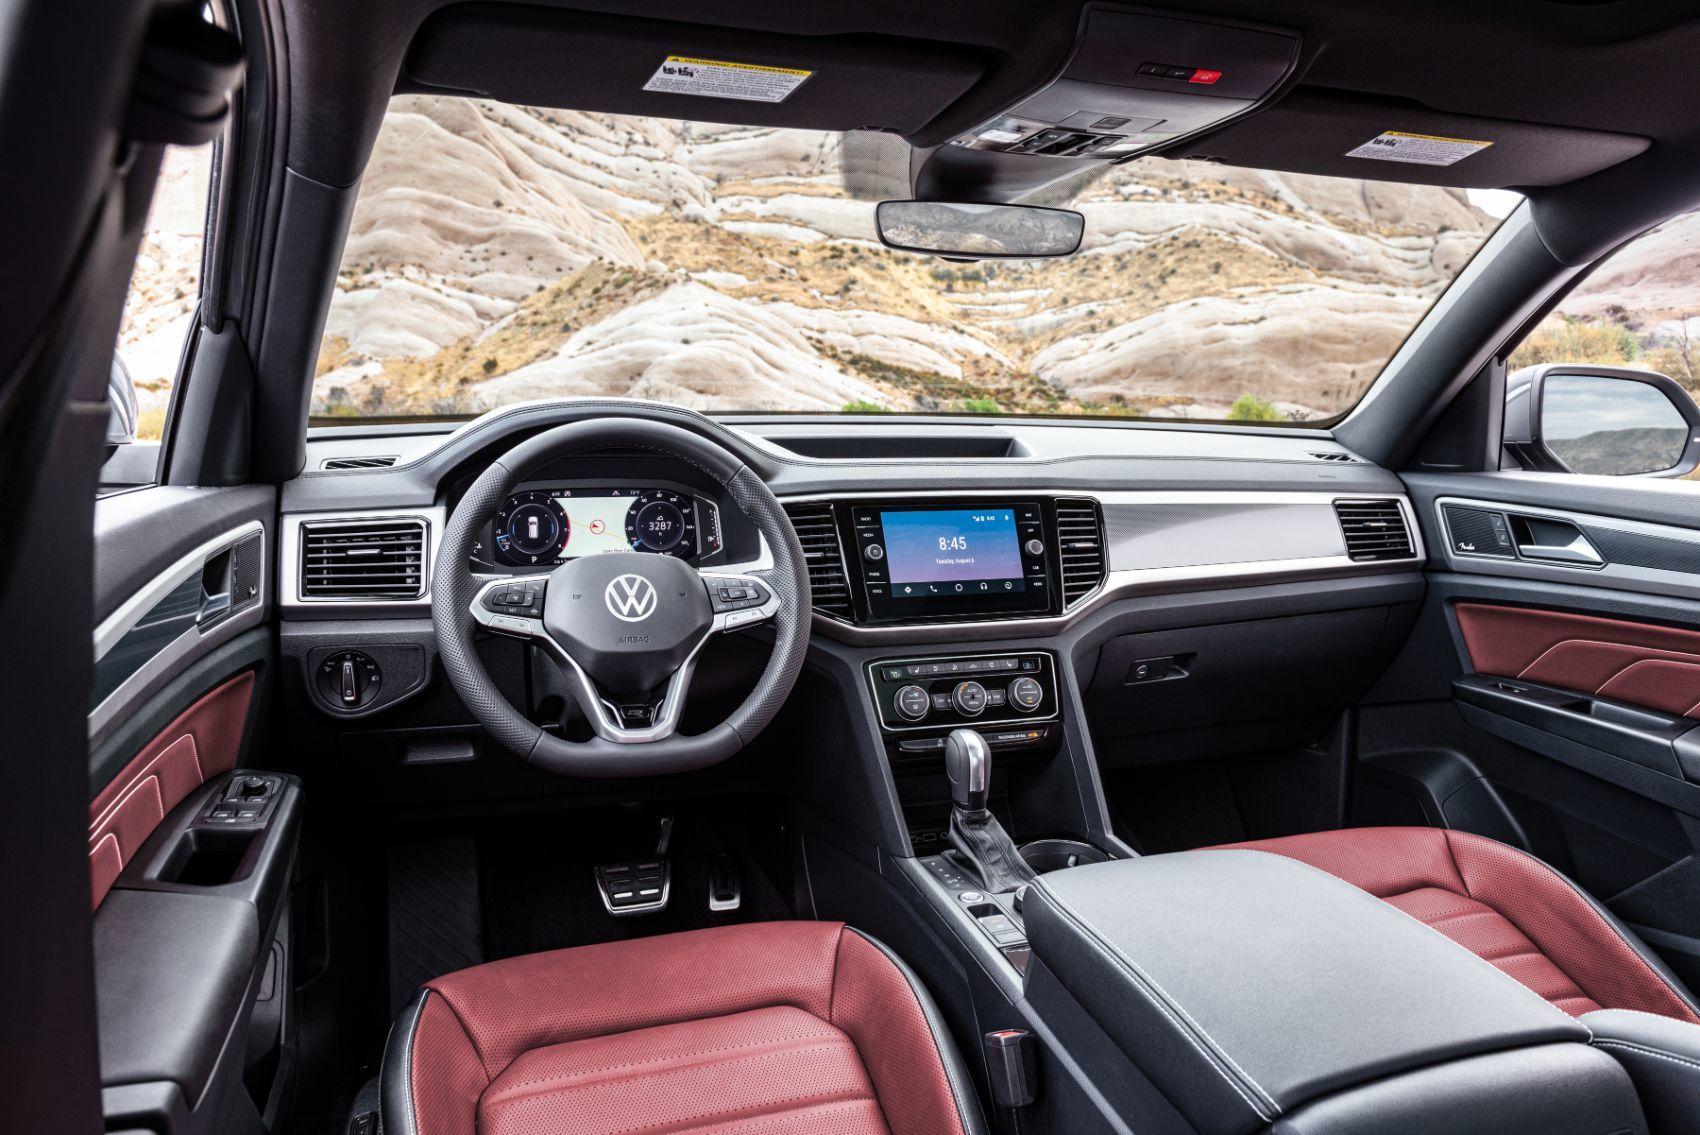 2020 VW Atlas Cross Sport interior layout.